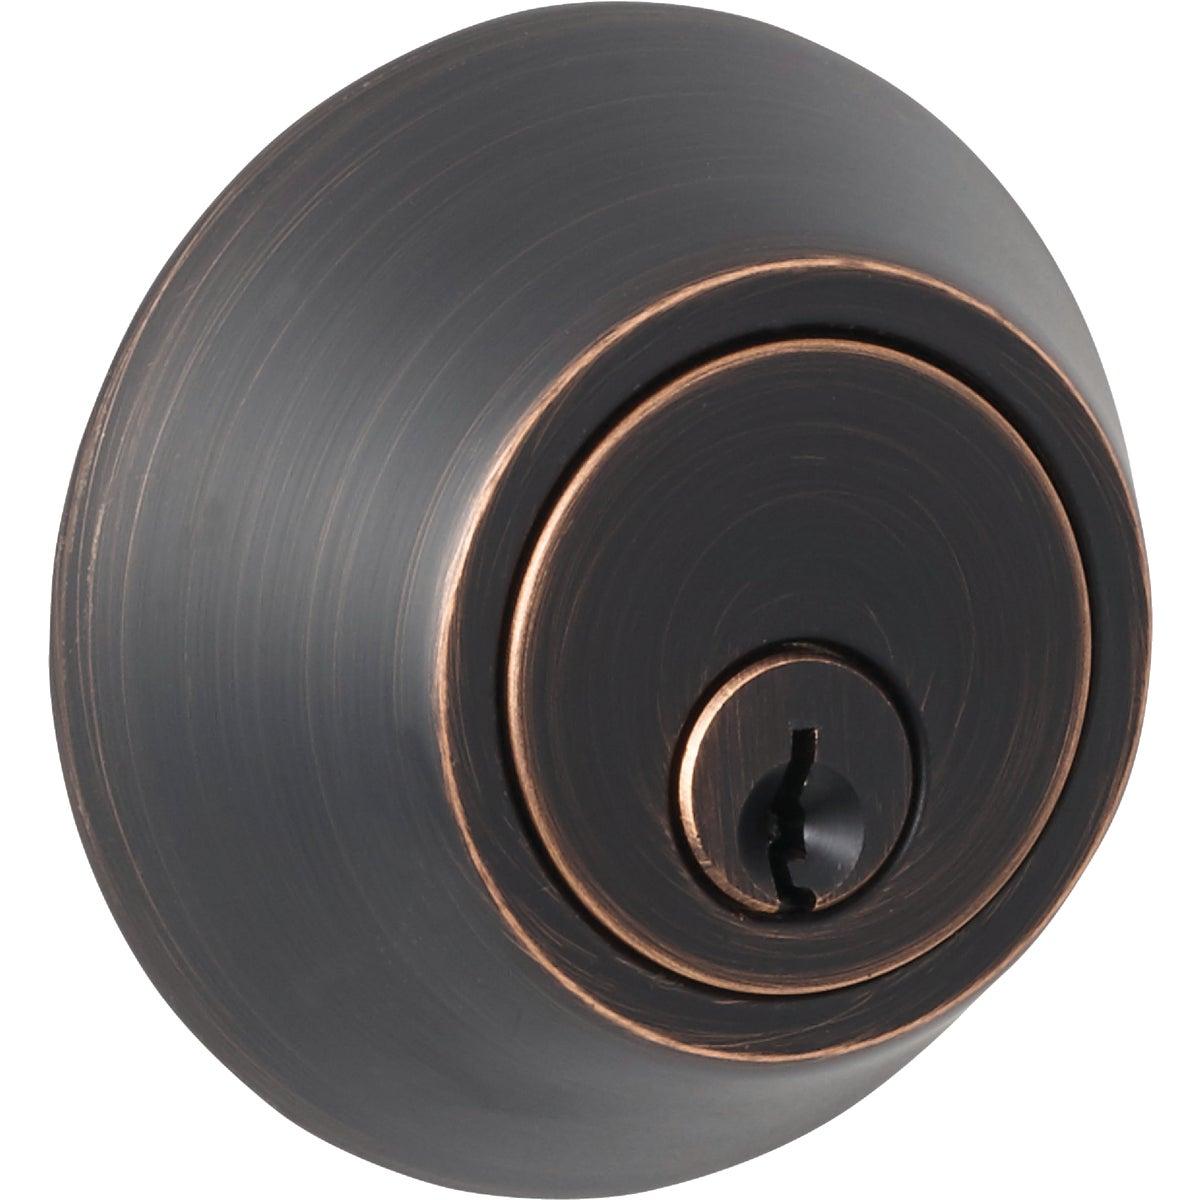 Steel Pro ORB CP 1CYL DEADBOLT D101ORB CP